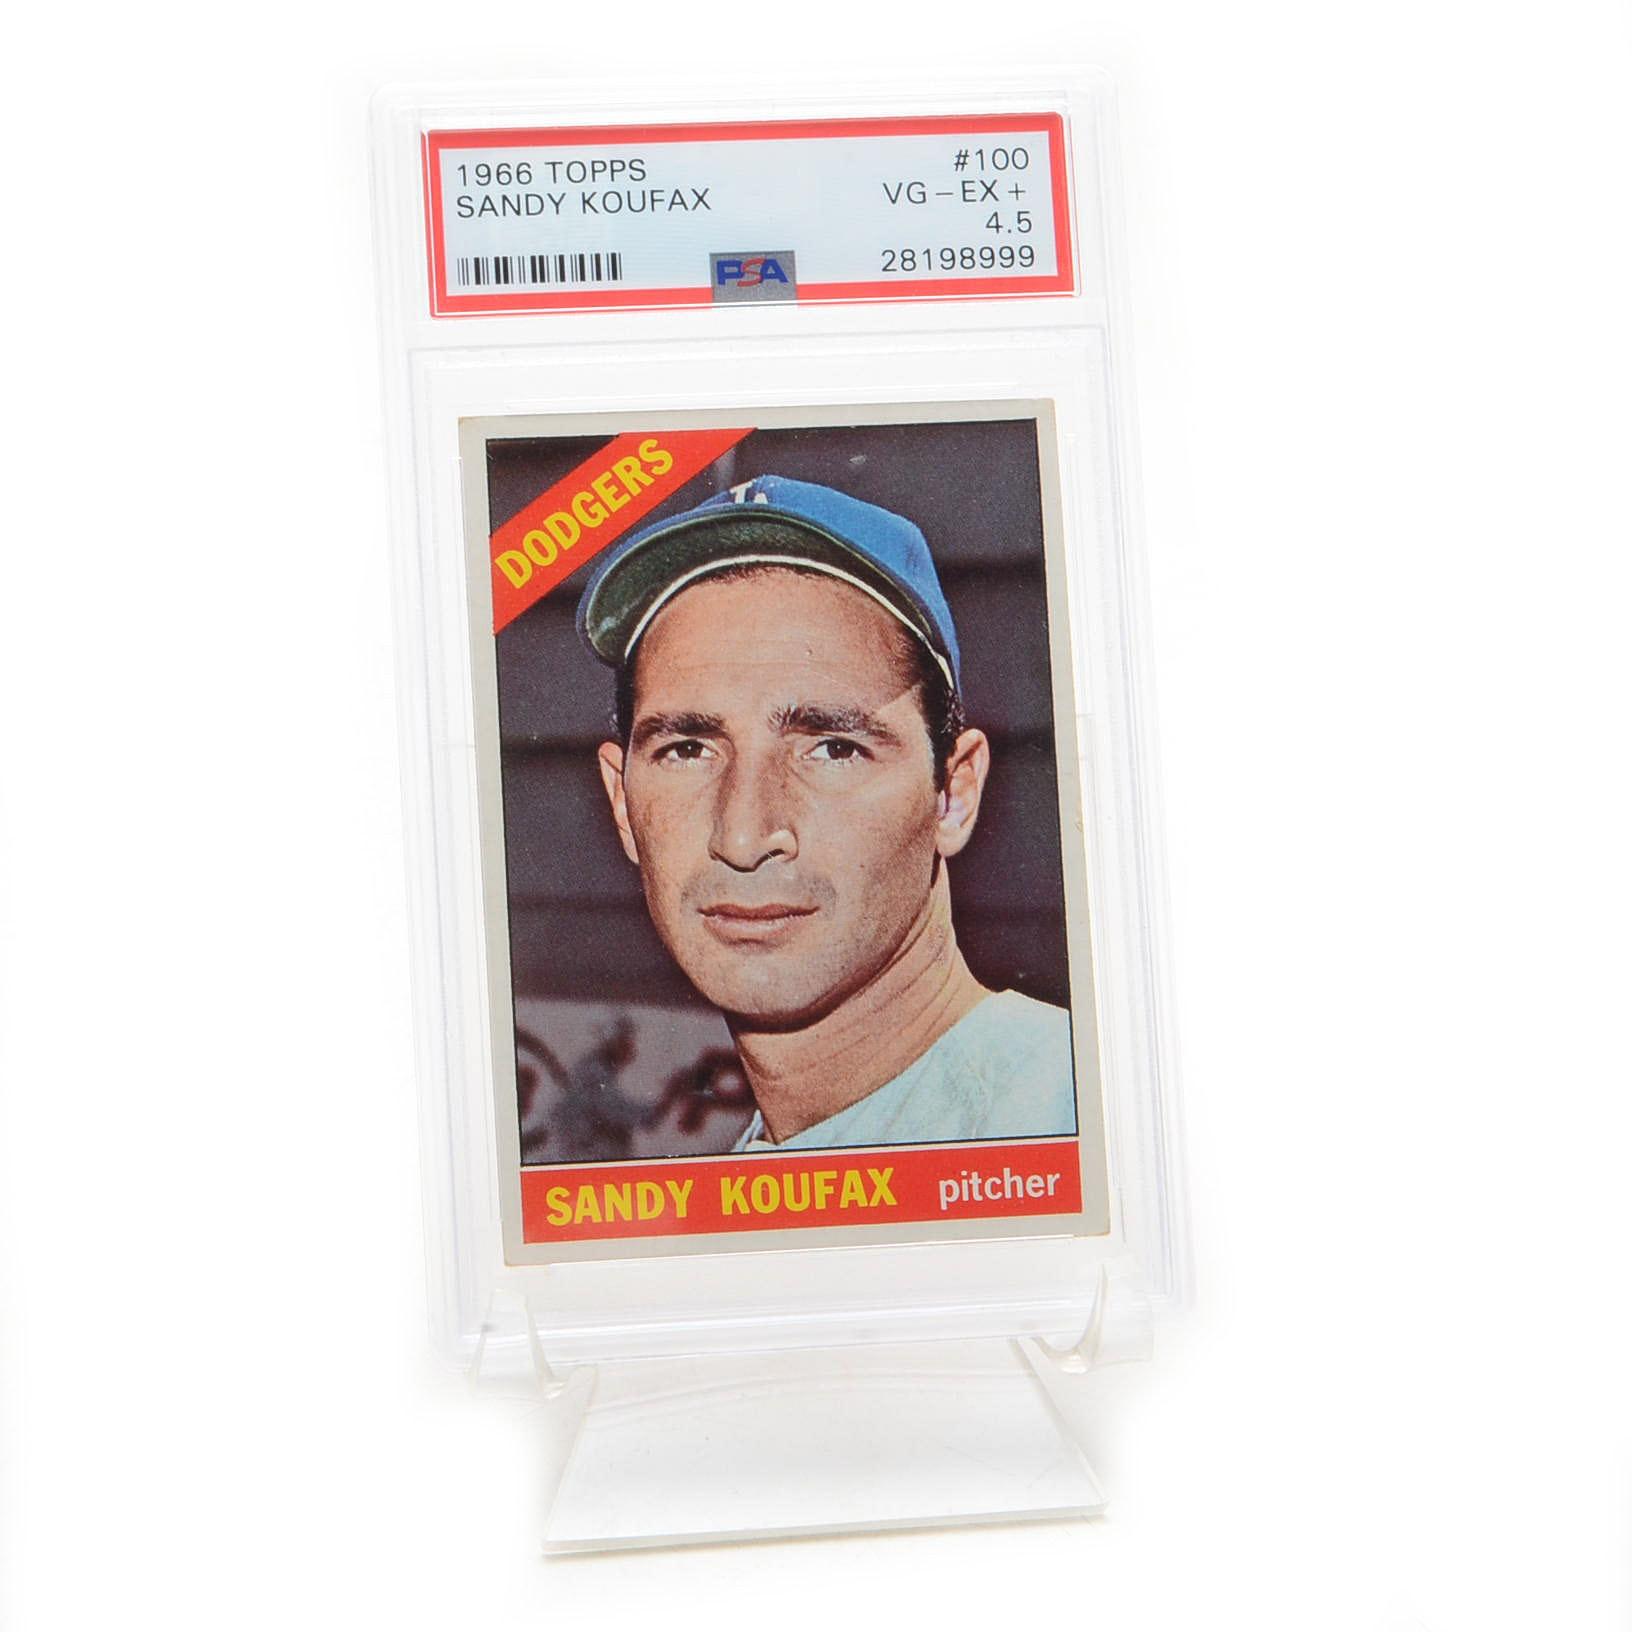 1966 Sandy Koufax Dodgers Topps PSA Graded Baseball Card